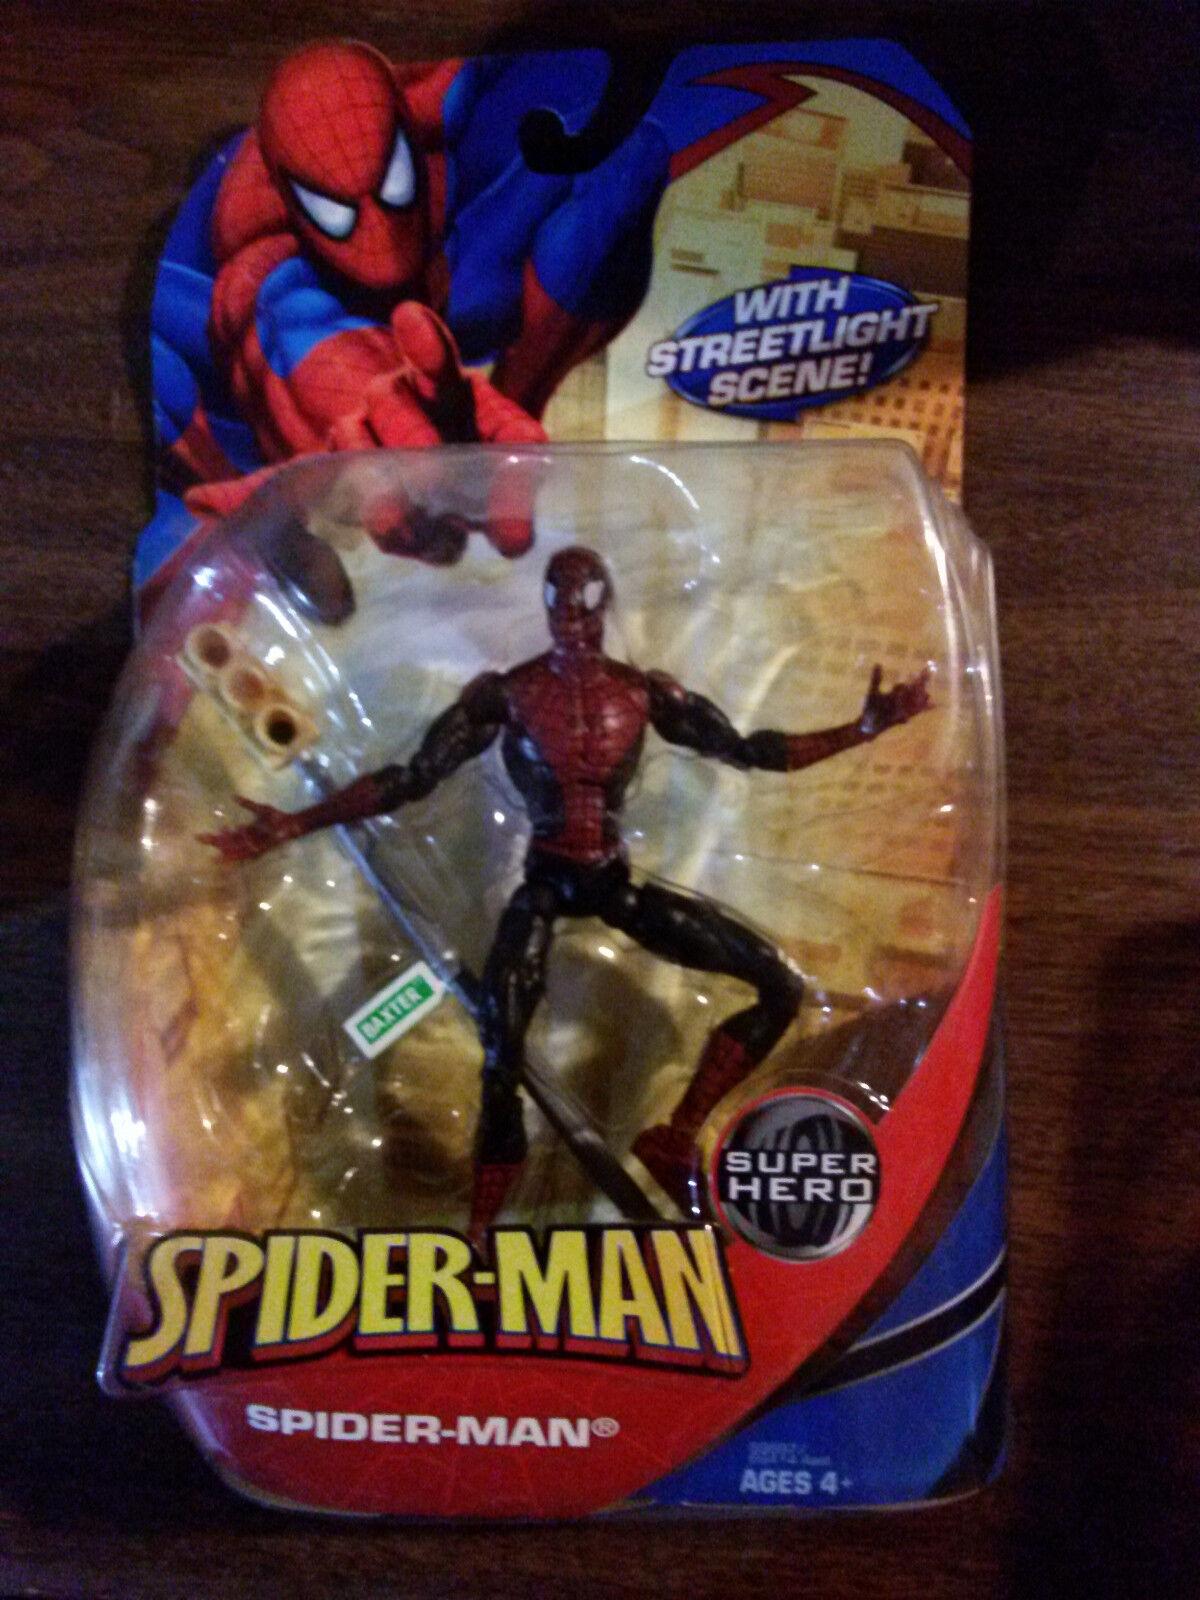 Marvel mcfarlane smc spider - man toybiz straßenszene neue selten